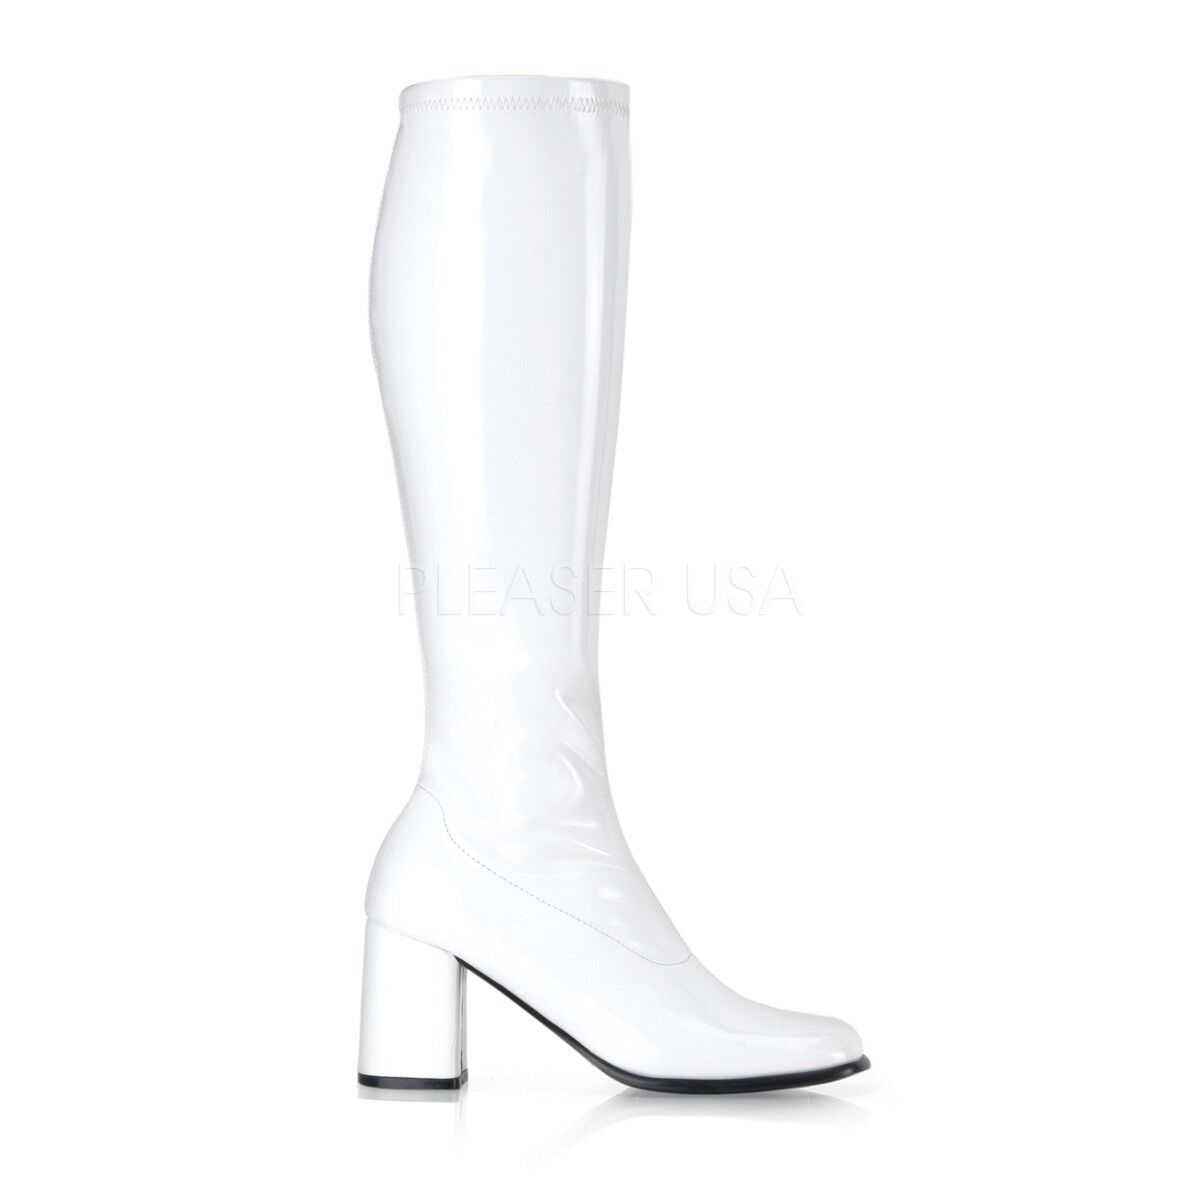 Funtasma 3  Block Heel Shiny blanc Stretch GoGo Knee bottes Hero Cosplay 5-16